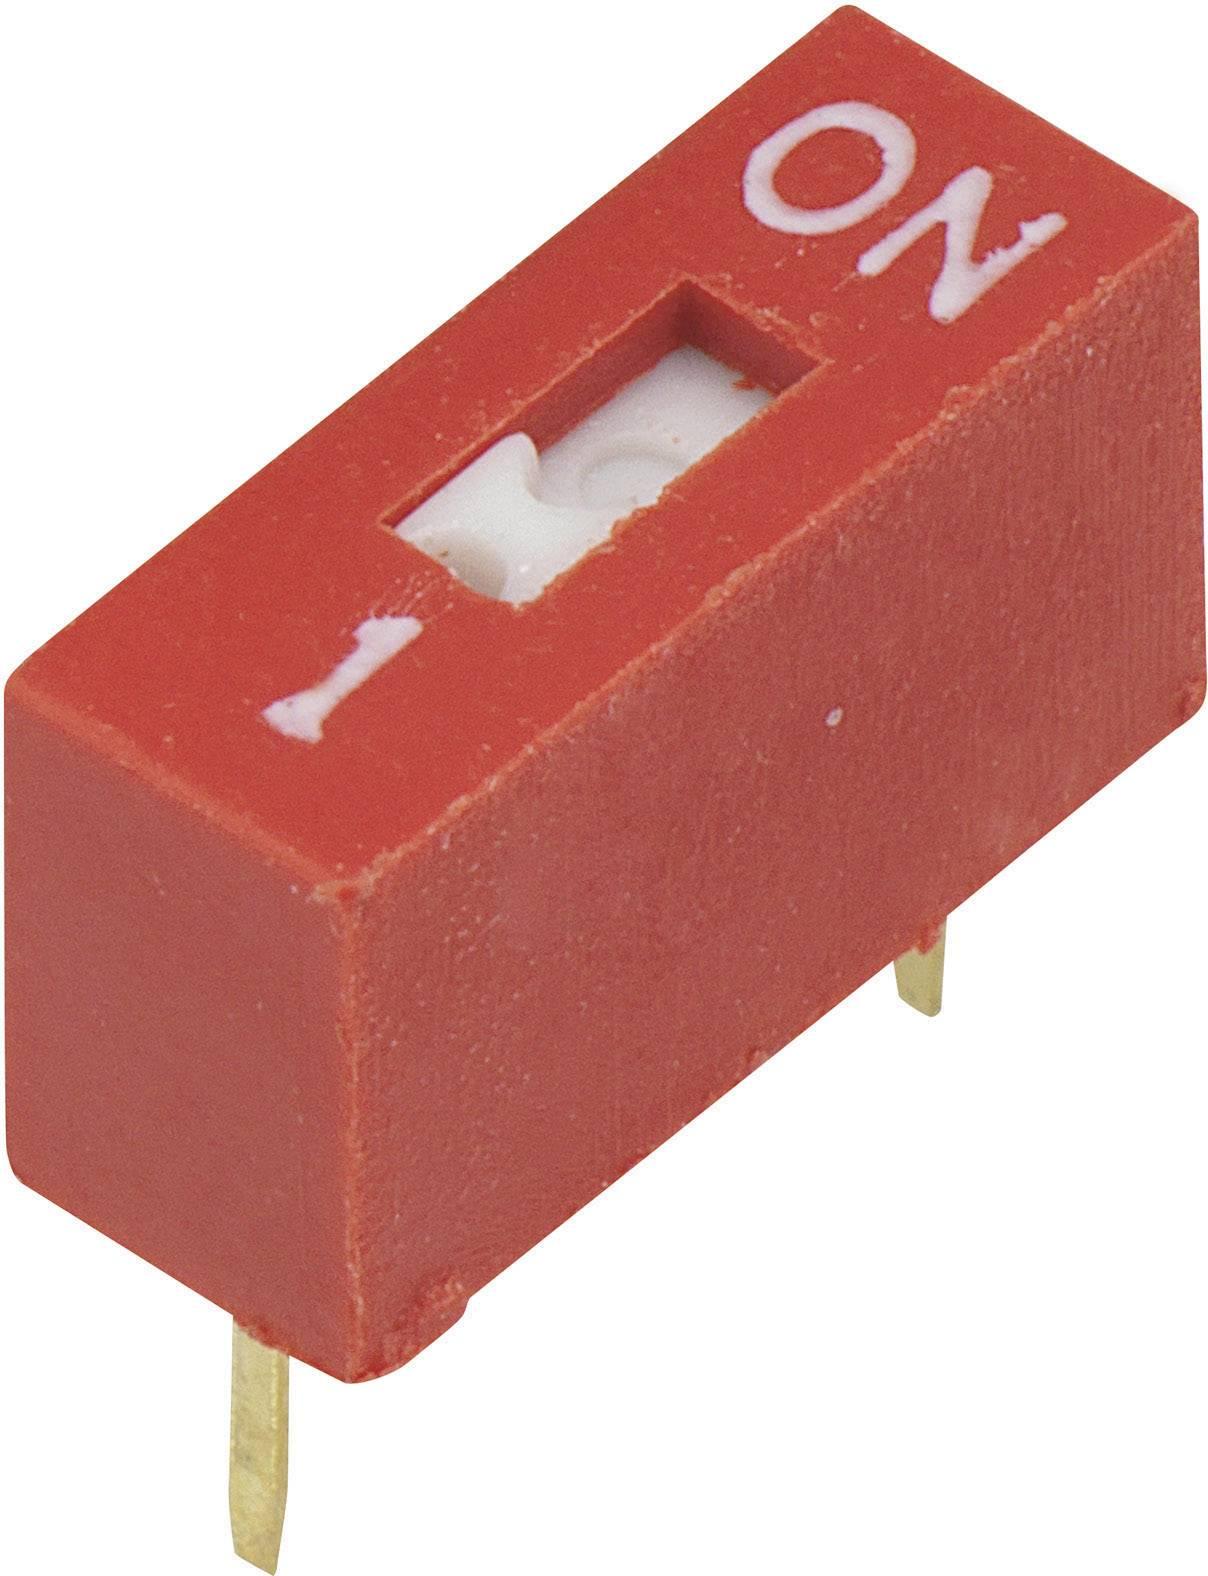 DIP spínač DSR-01, (š x v) 9,9 mm x 5,7 mm